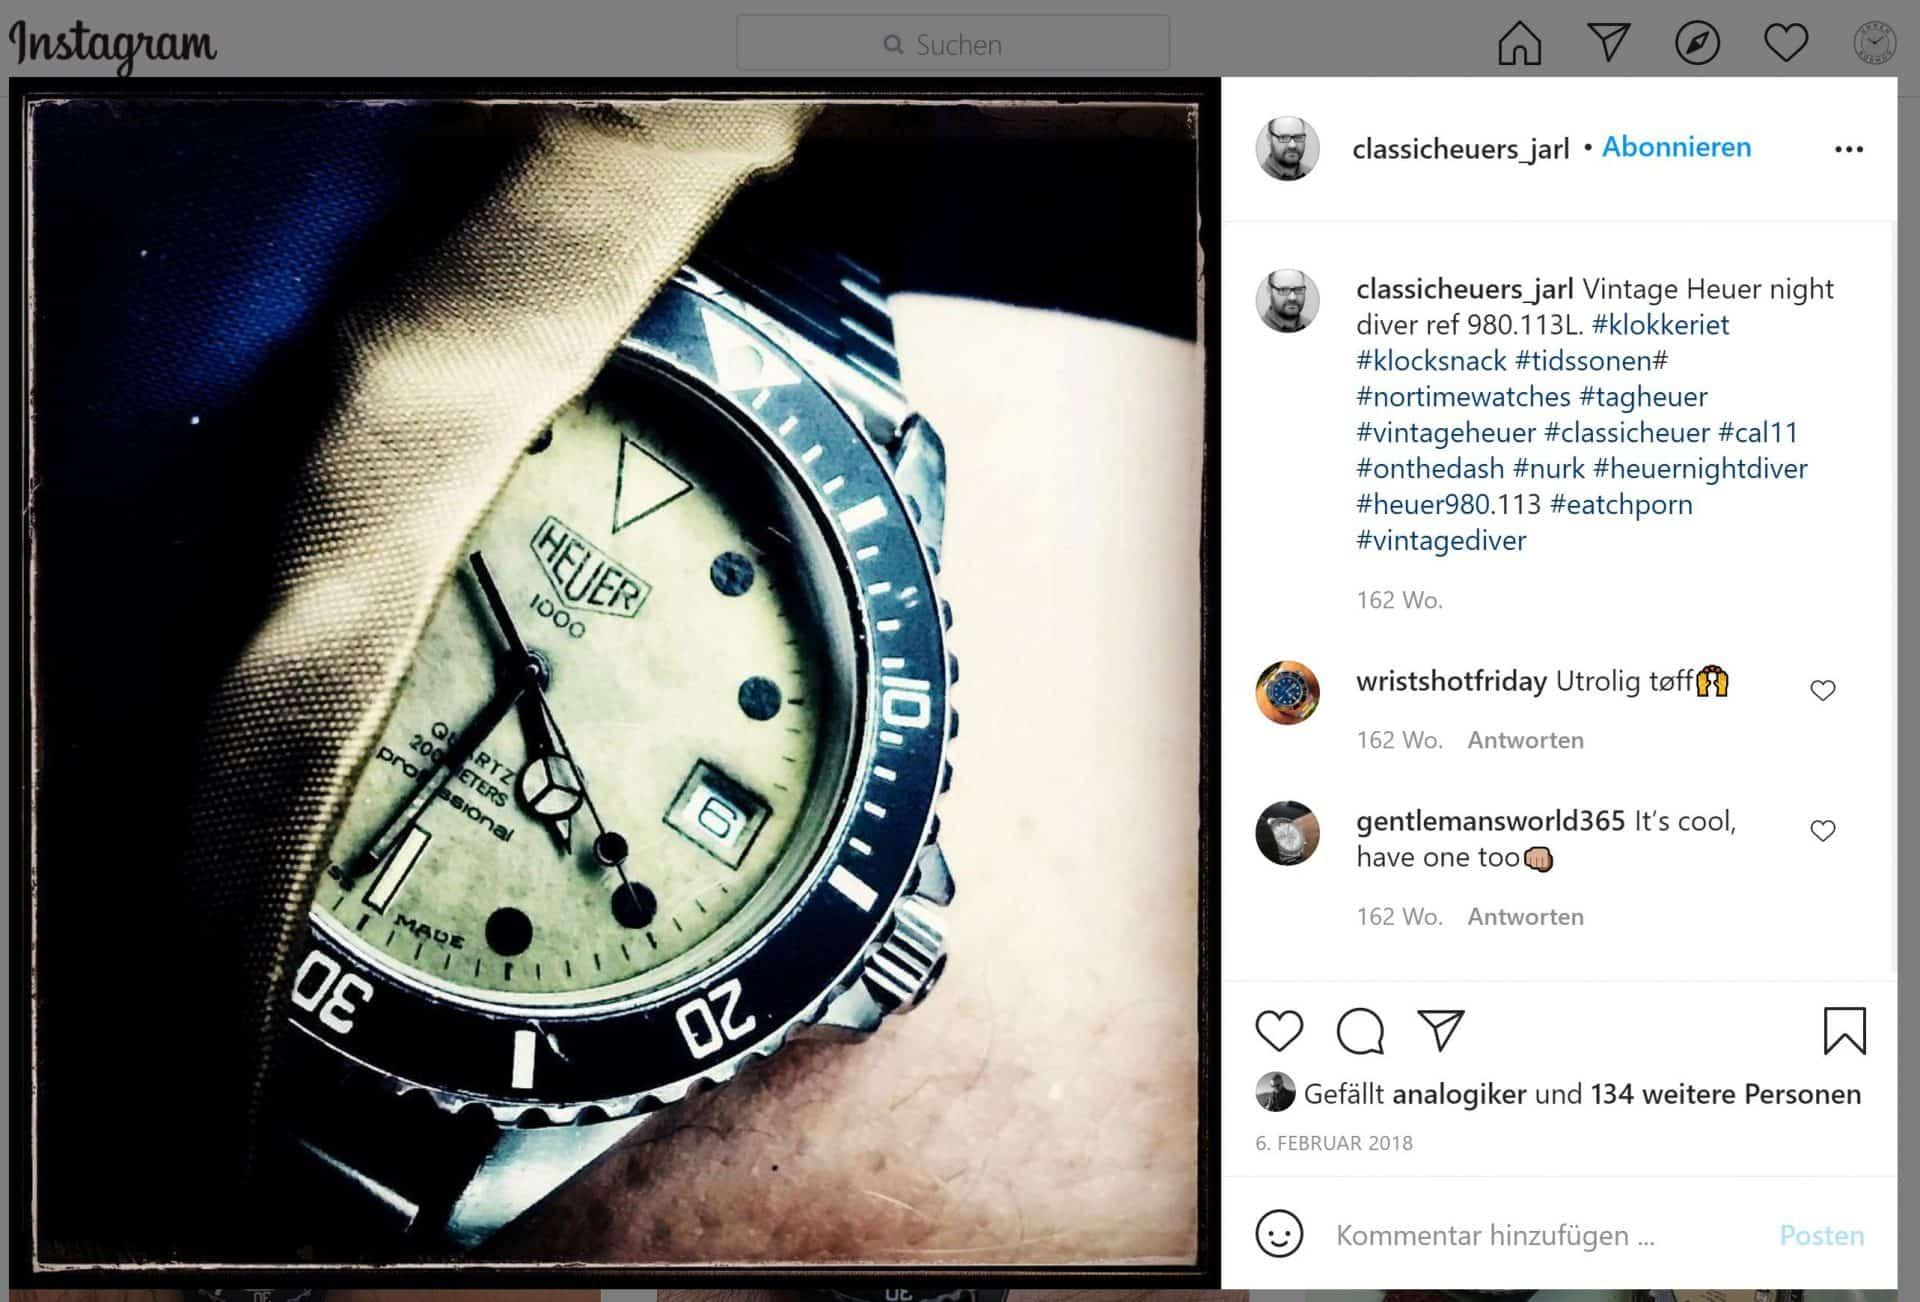 Heuer Night Diver Vintage Instagram Post